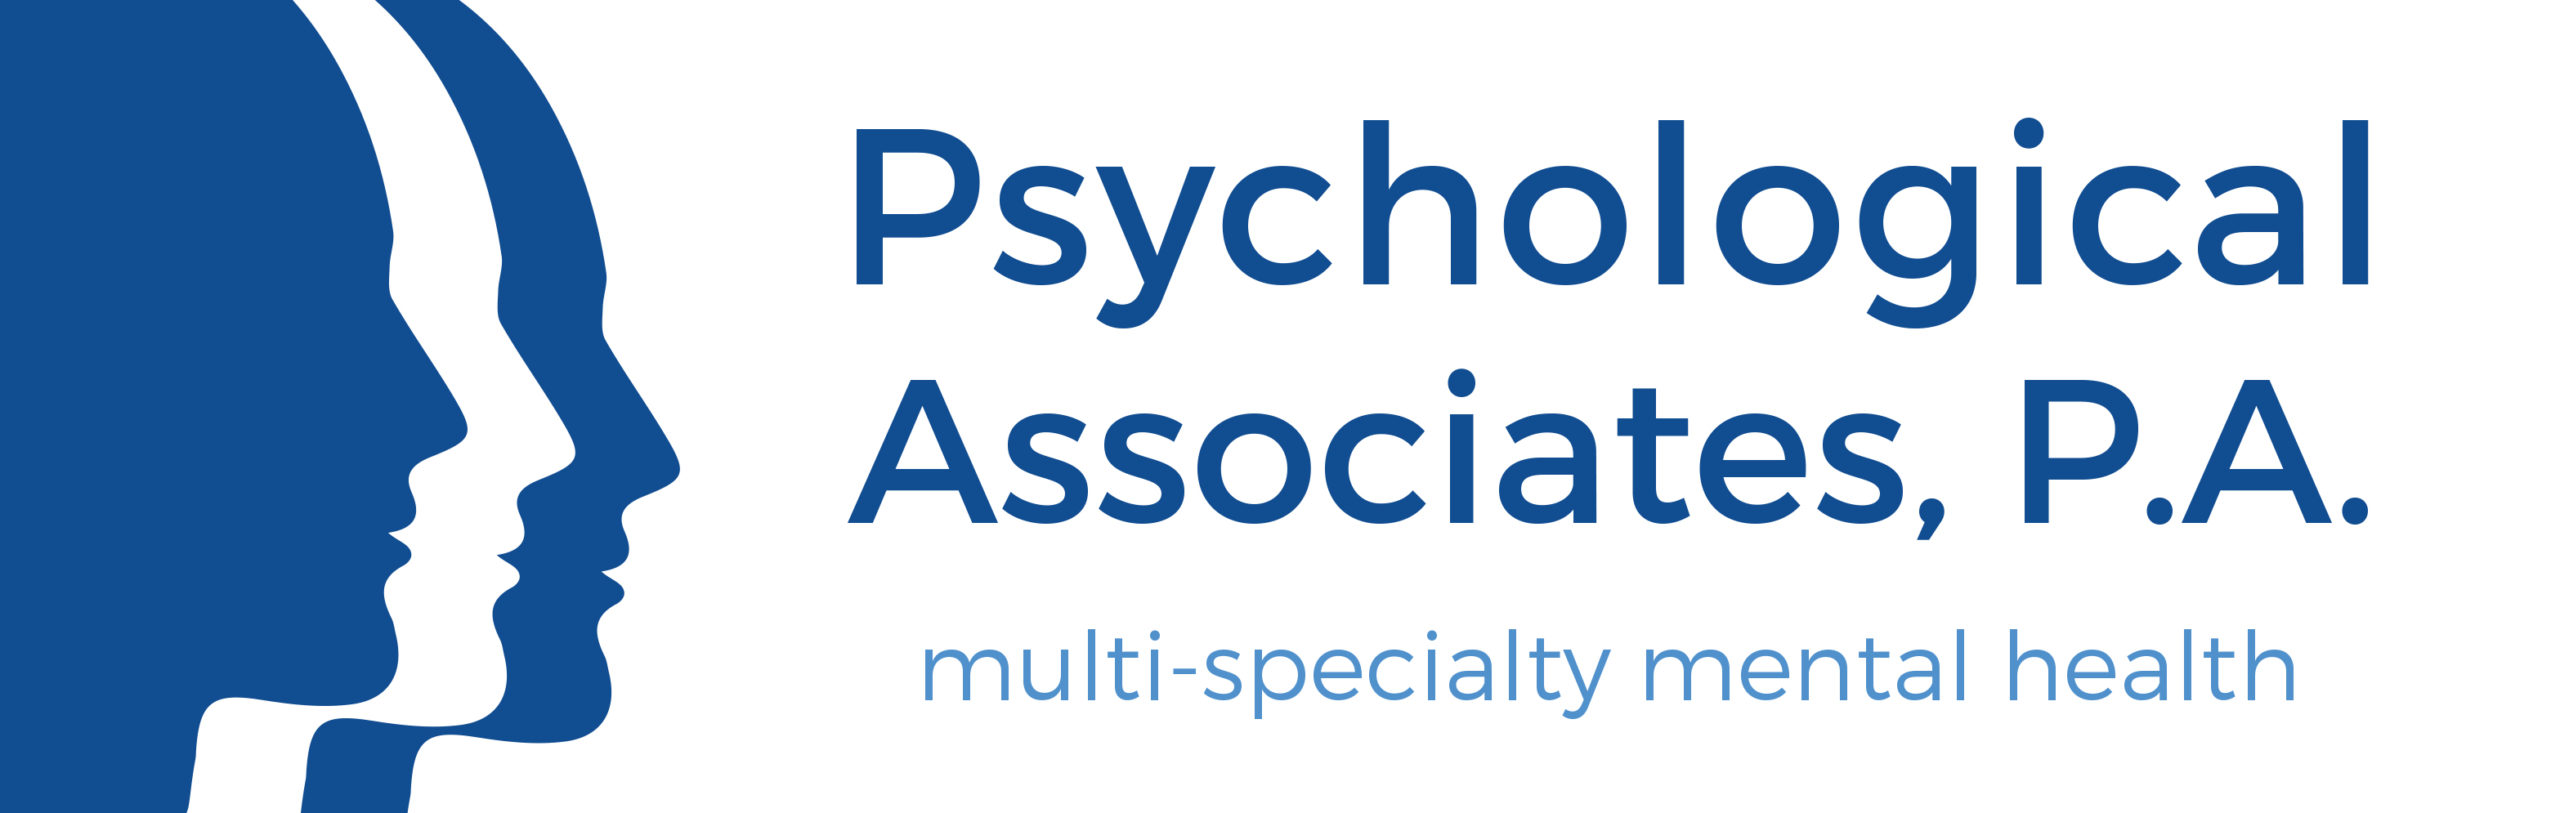 Psychological Associates, P.A.